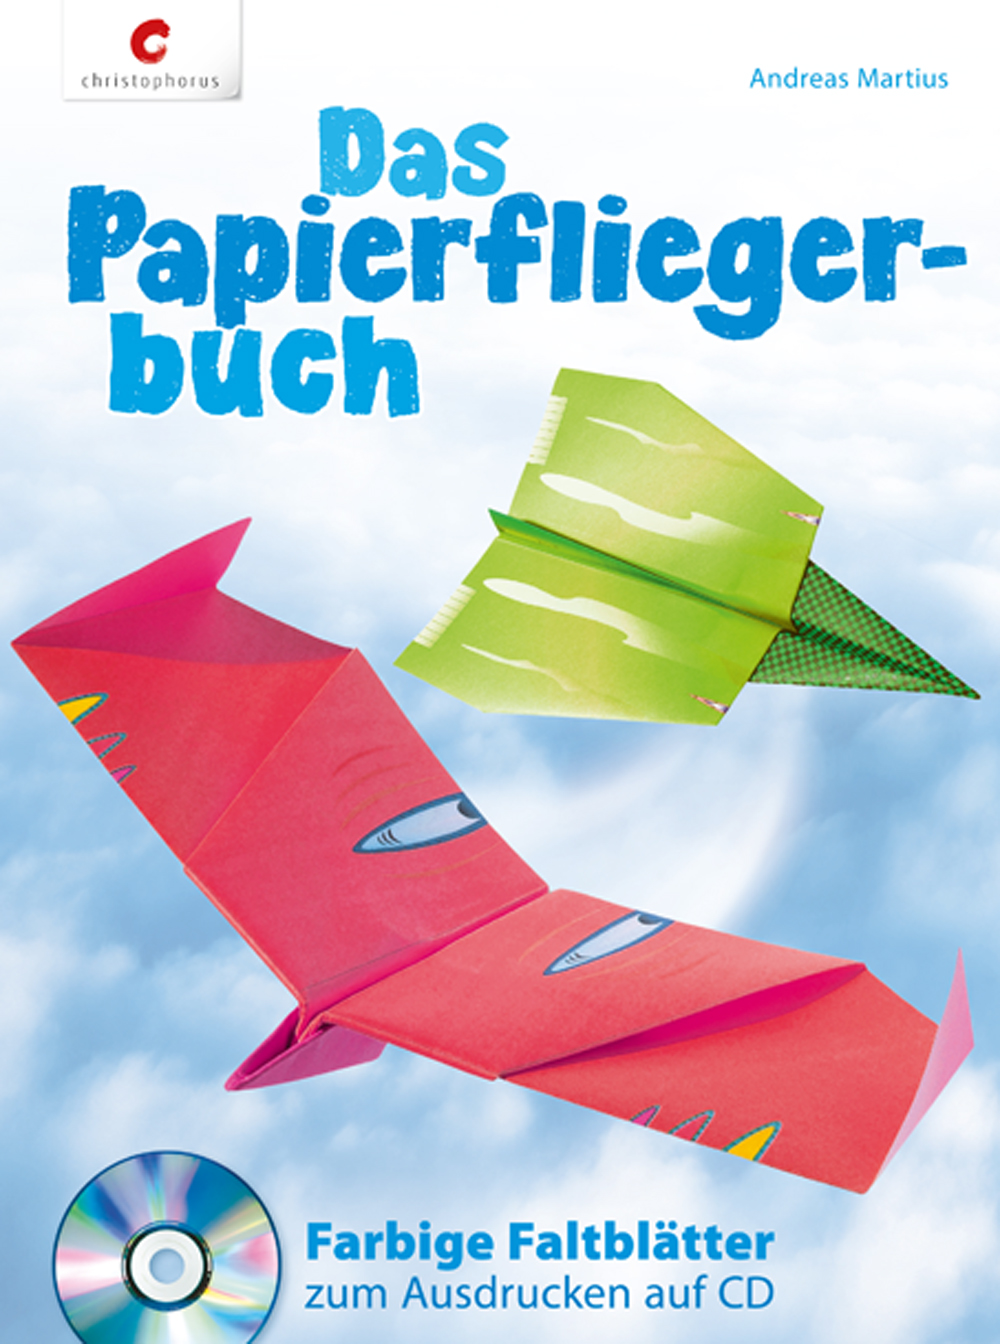 Das Papierfliegerbuch: Farbige Faltblätter zum Ausdrucken auf CD - Andreas Martius